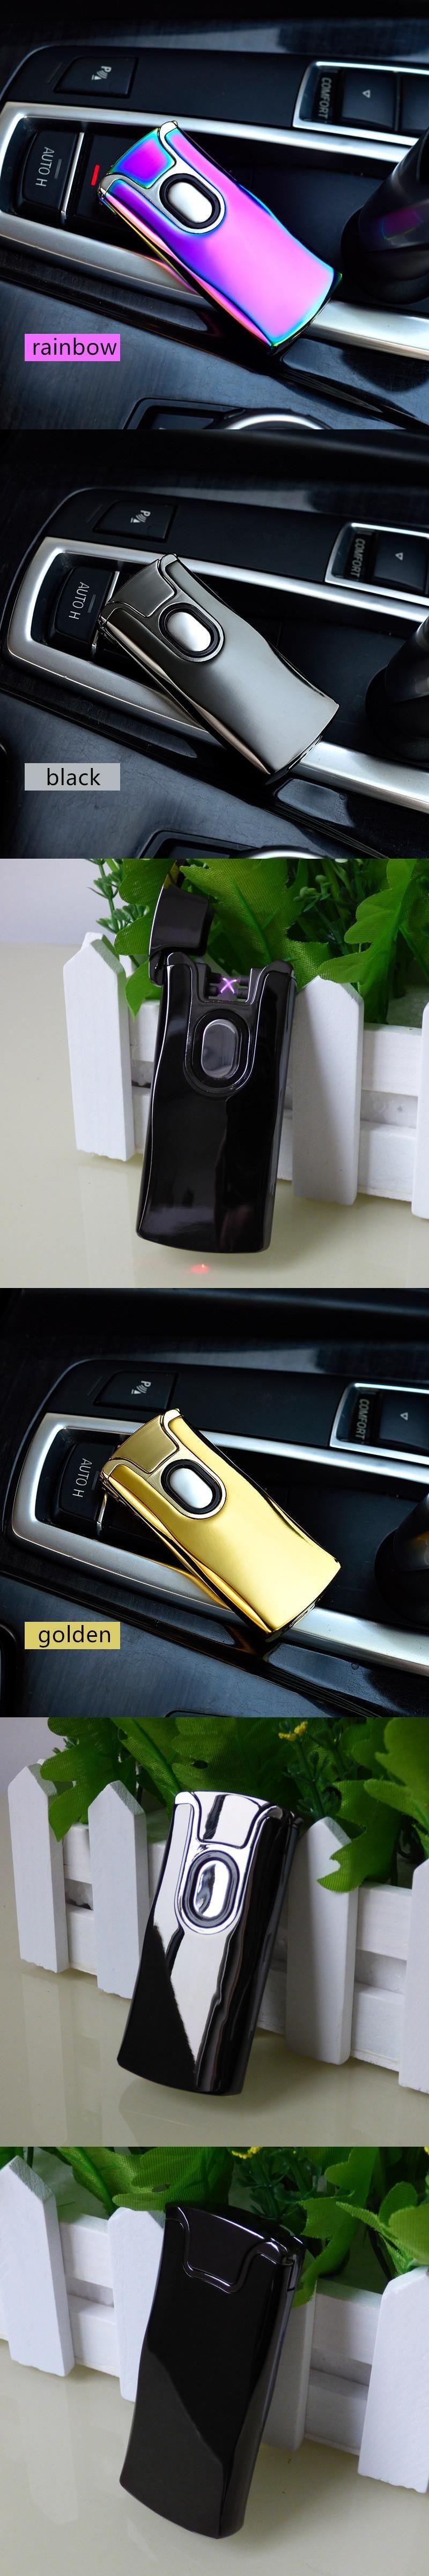 USB Thunder Lighter Rechargeable Electronic Lighter Cigarette Plasma Double  Arc Palse Pulse Windproof Car Gadgets For